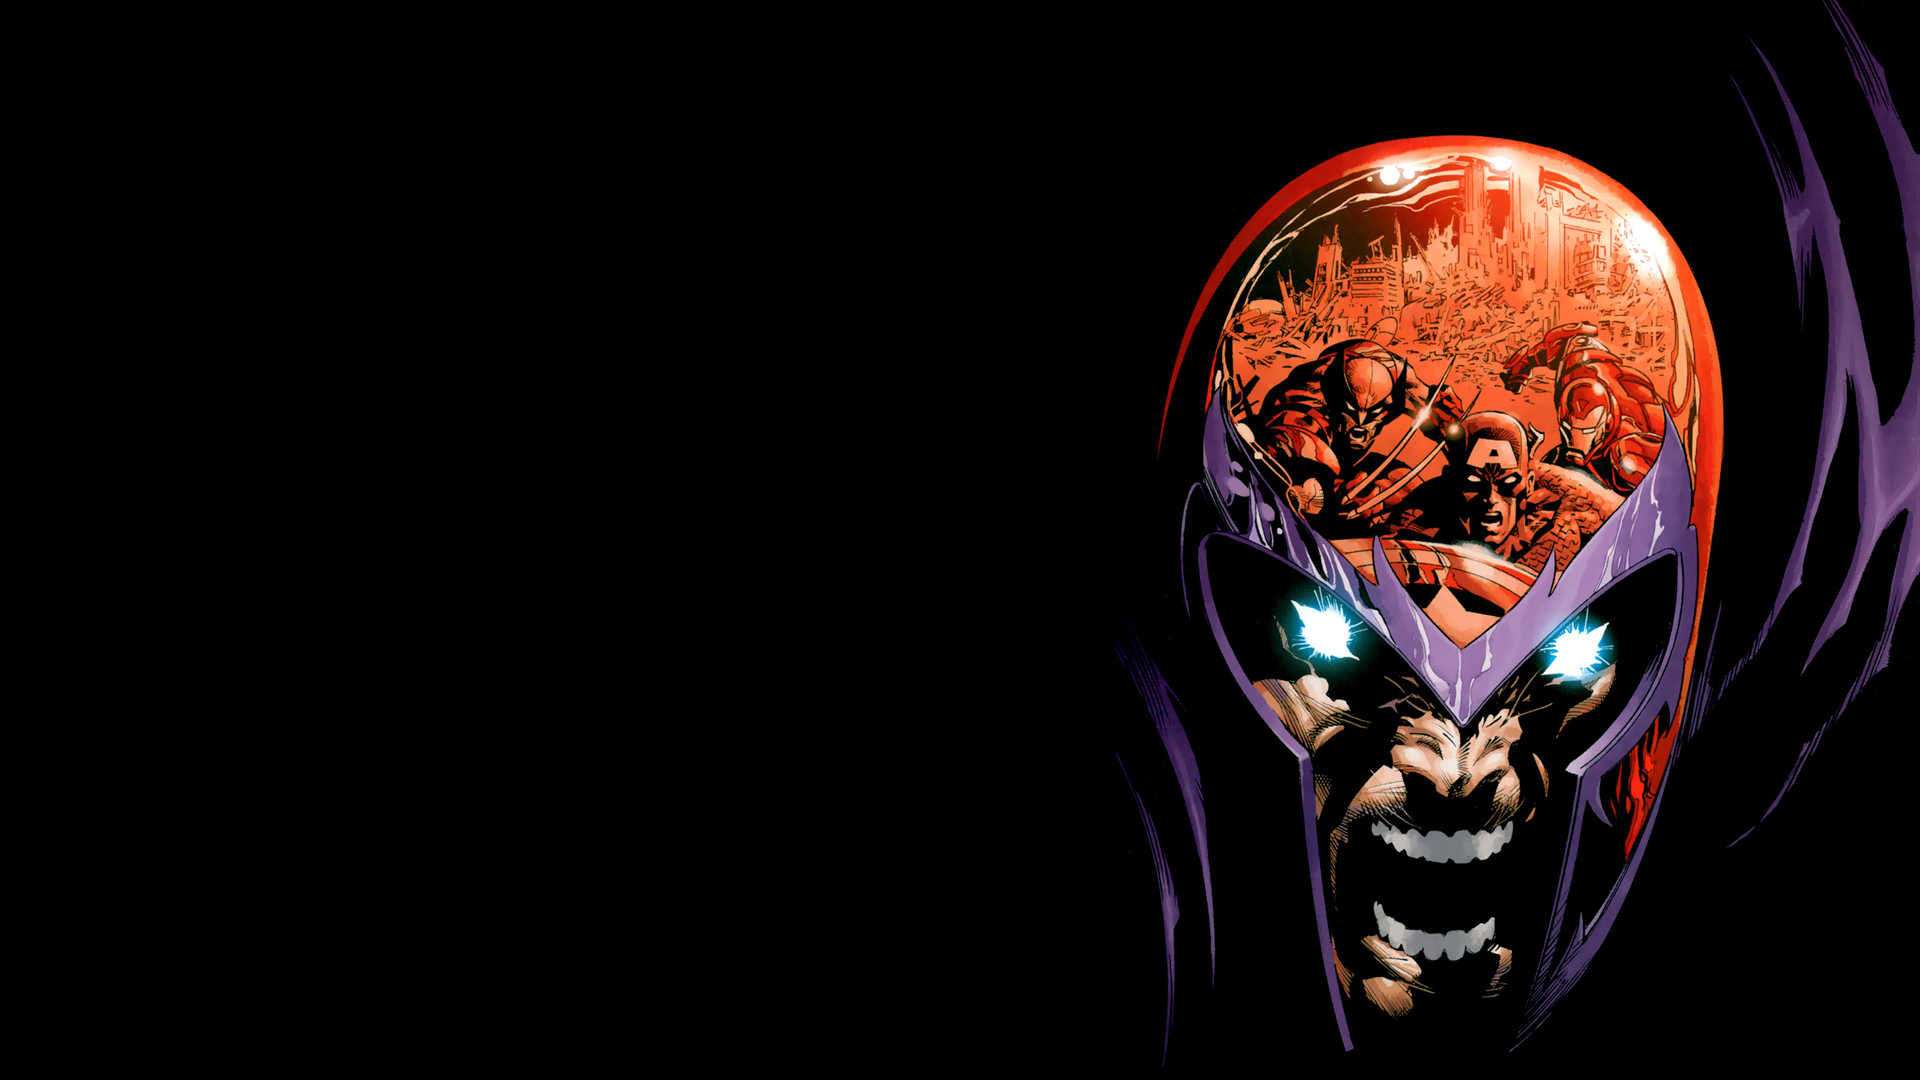 1080P Marvel Wallpaper - WallpaperSafari Deadpool Vs Spiderman Wallpaper 1920x1080